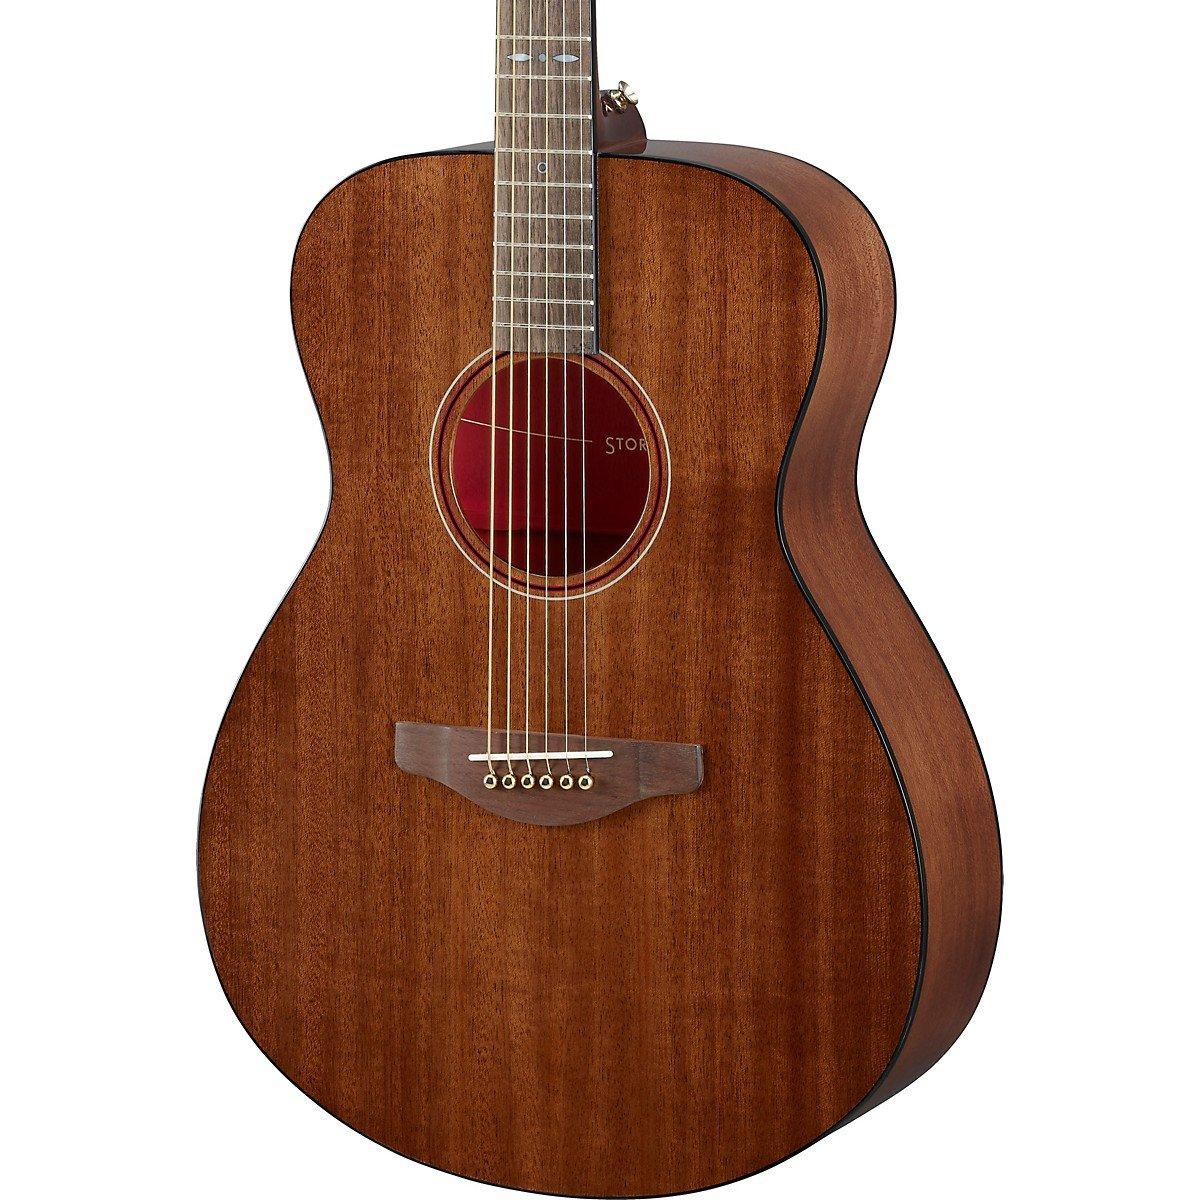 Yamaha Storia III Acoustic-Electric Mahogany Top Guitar